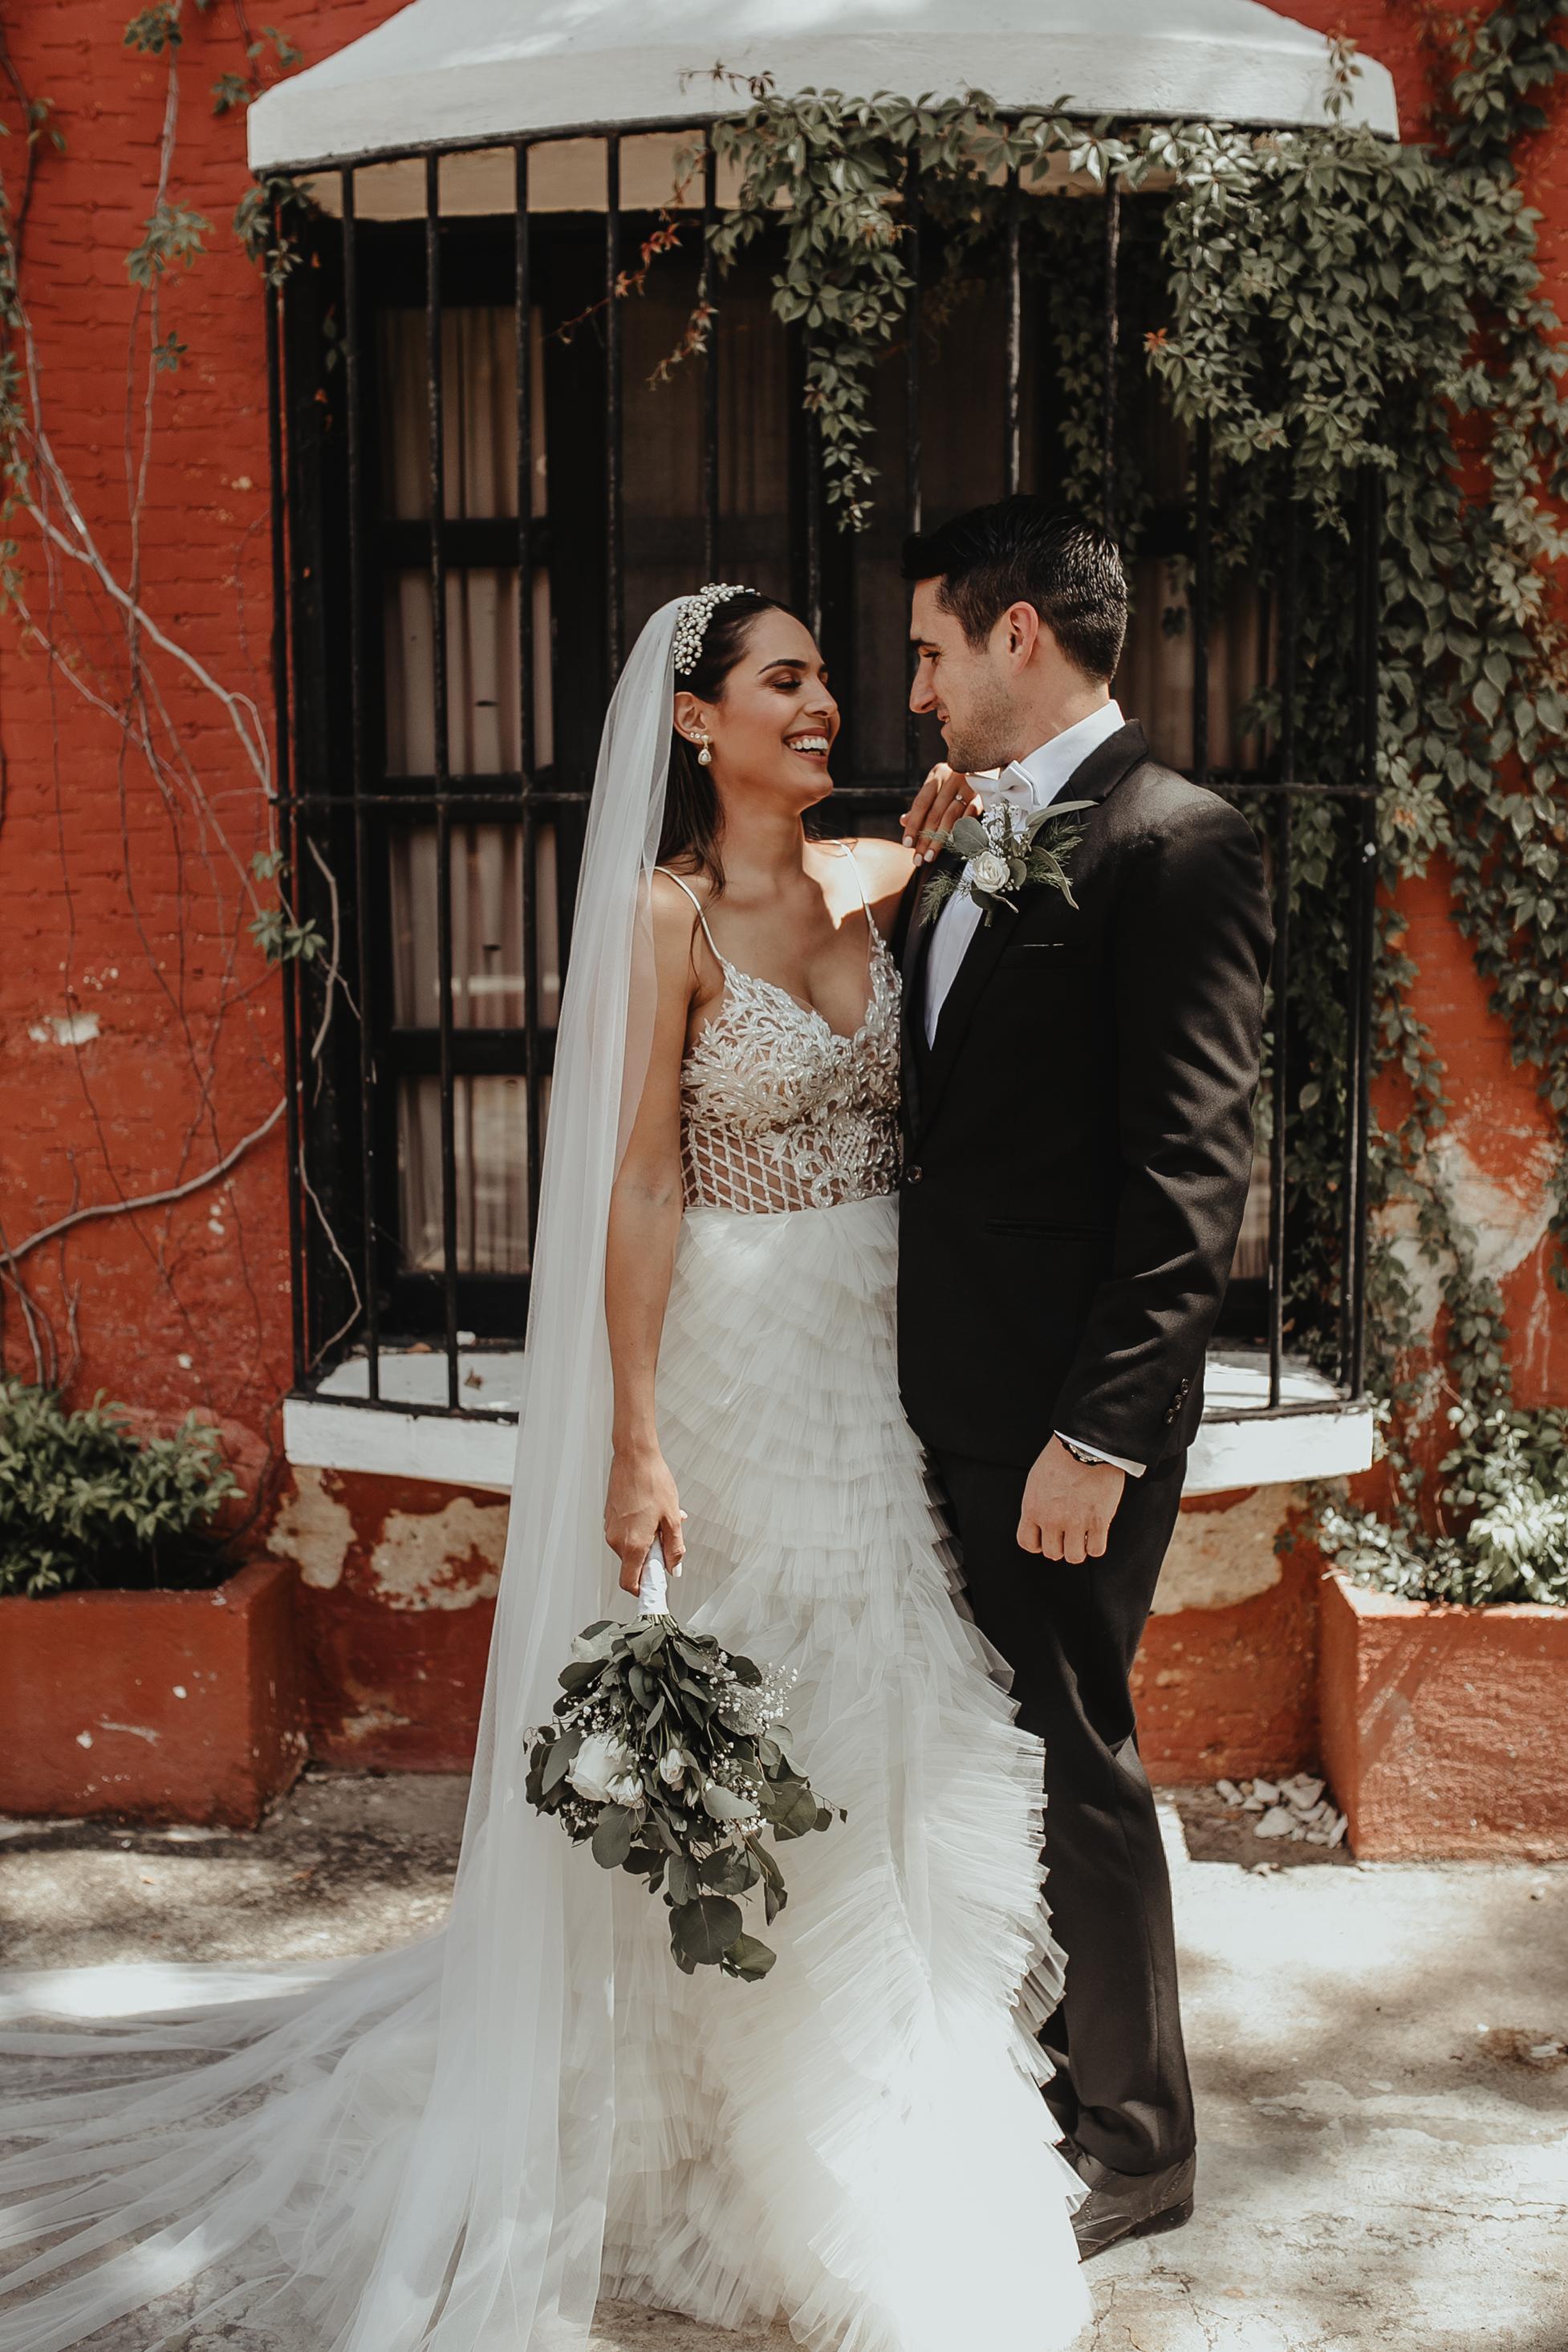 0309R&F__WeddingDestination_Weddingmerida_BodaMexico_FotografoDeBodas_FabrizioSimoneenFotografo.jpg